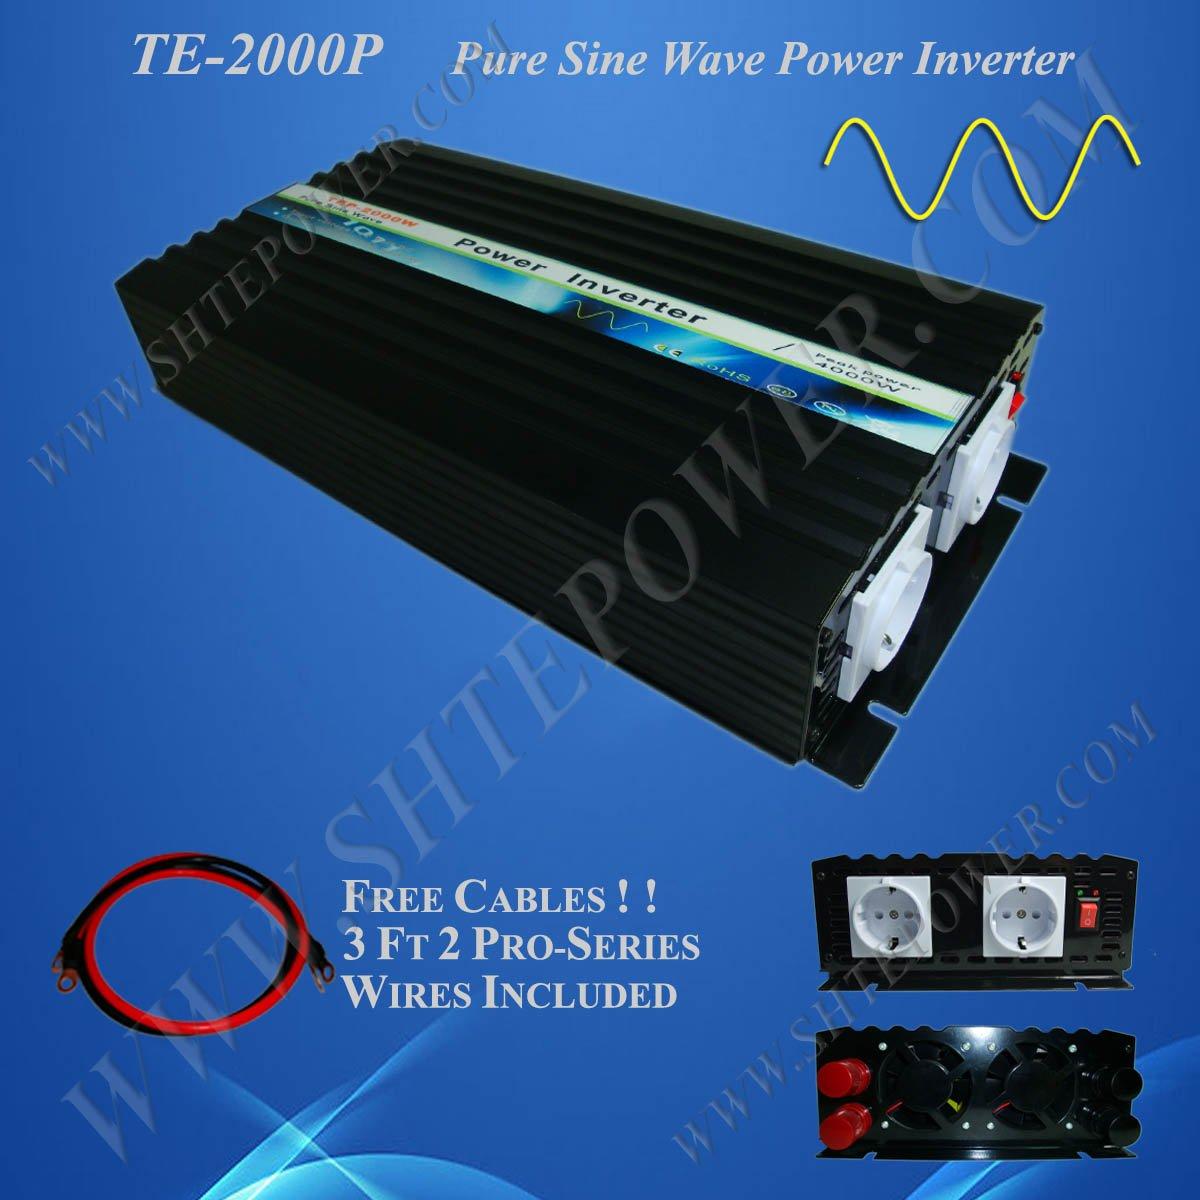 2kw off grid solar inverter 48v dc ac converter 110v/240v power inverter 48v2kw off grid solar inverter 48v dc ac converter 110v/240v power inverter 48v